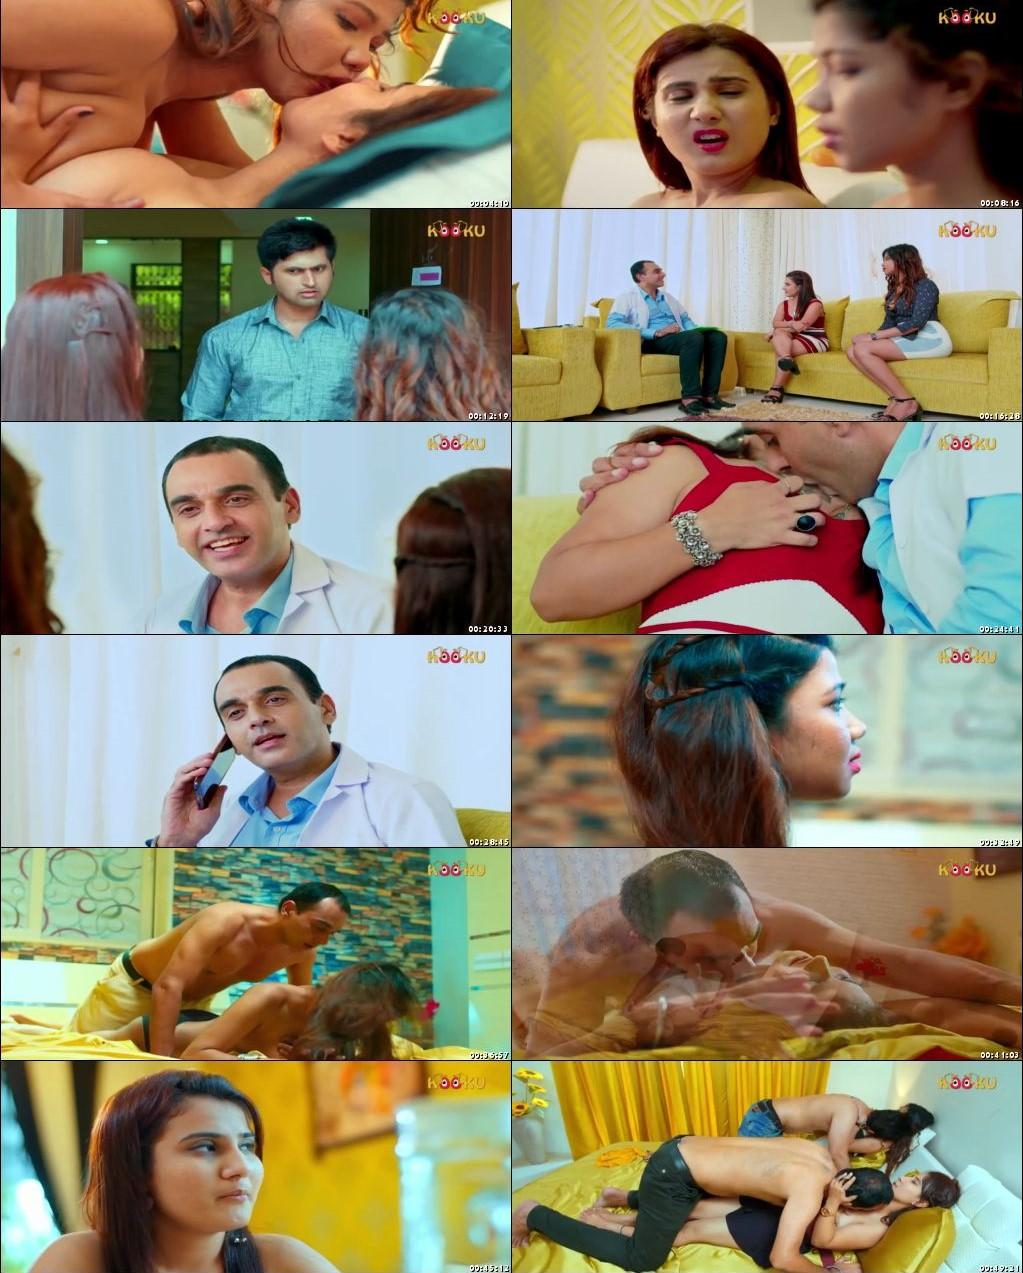 Saheli 2020 Full Hindi Episode HDRip 720p Online Watch